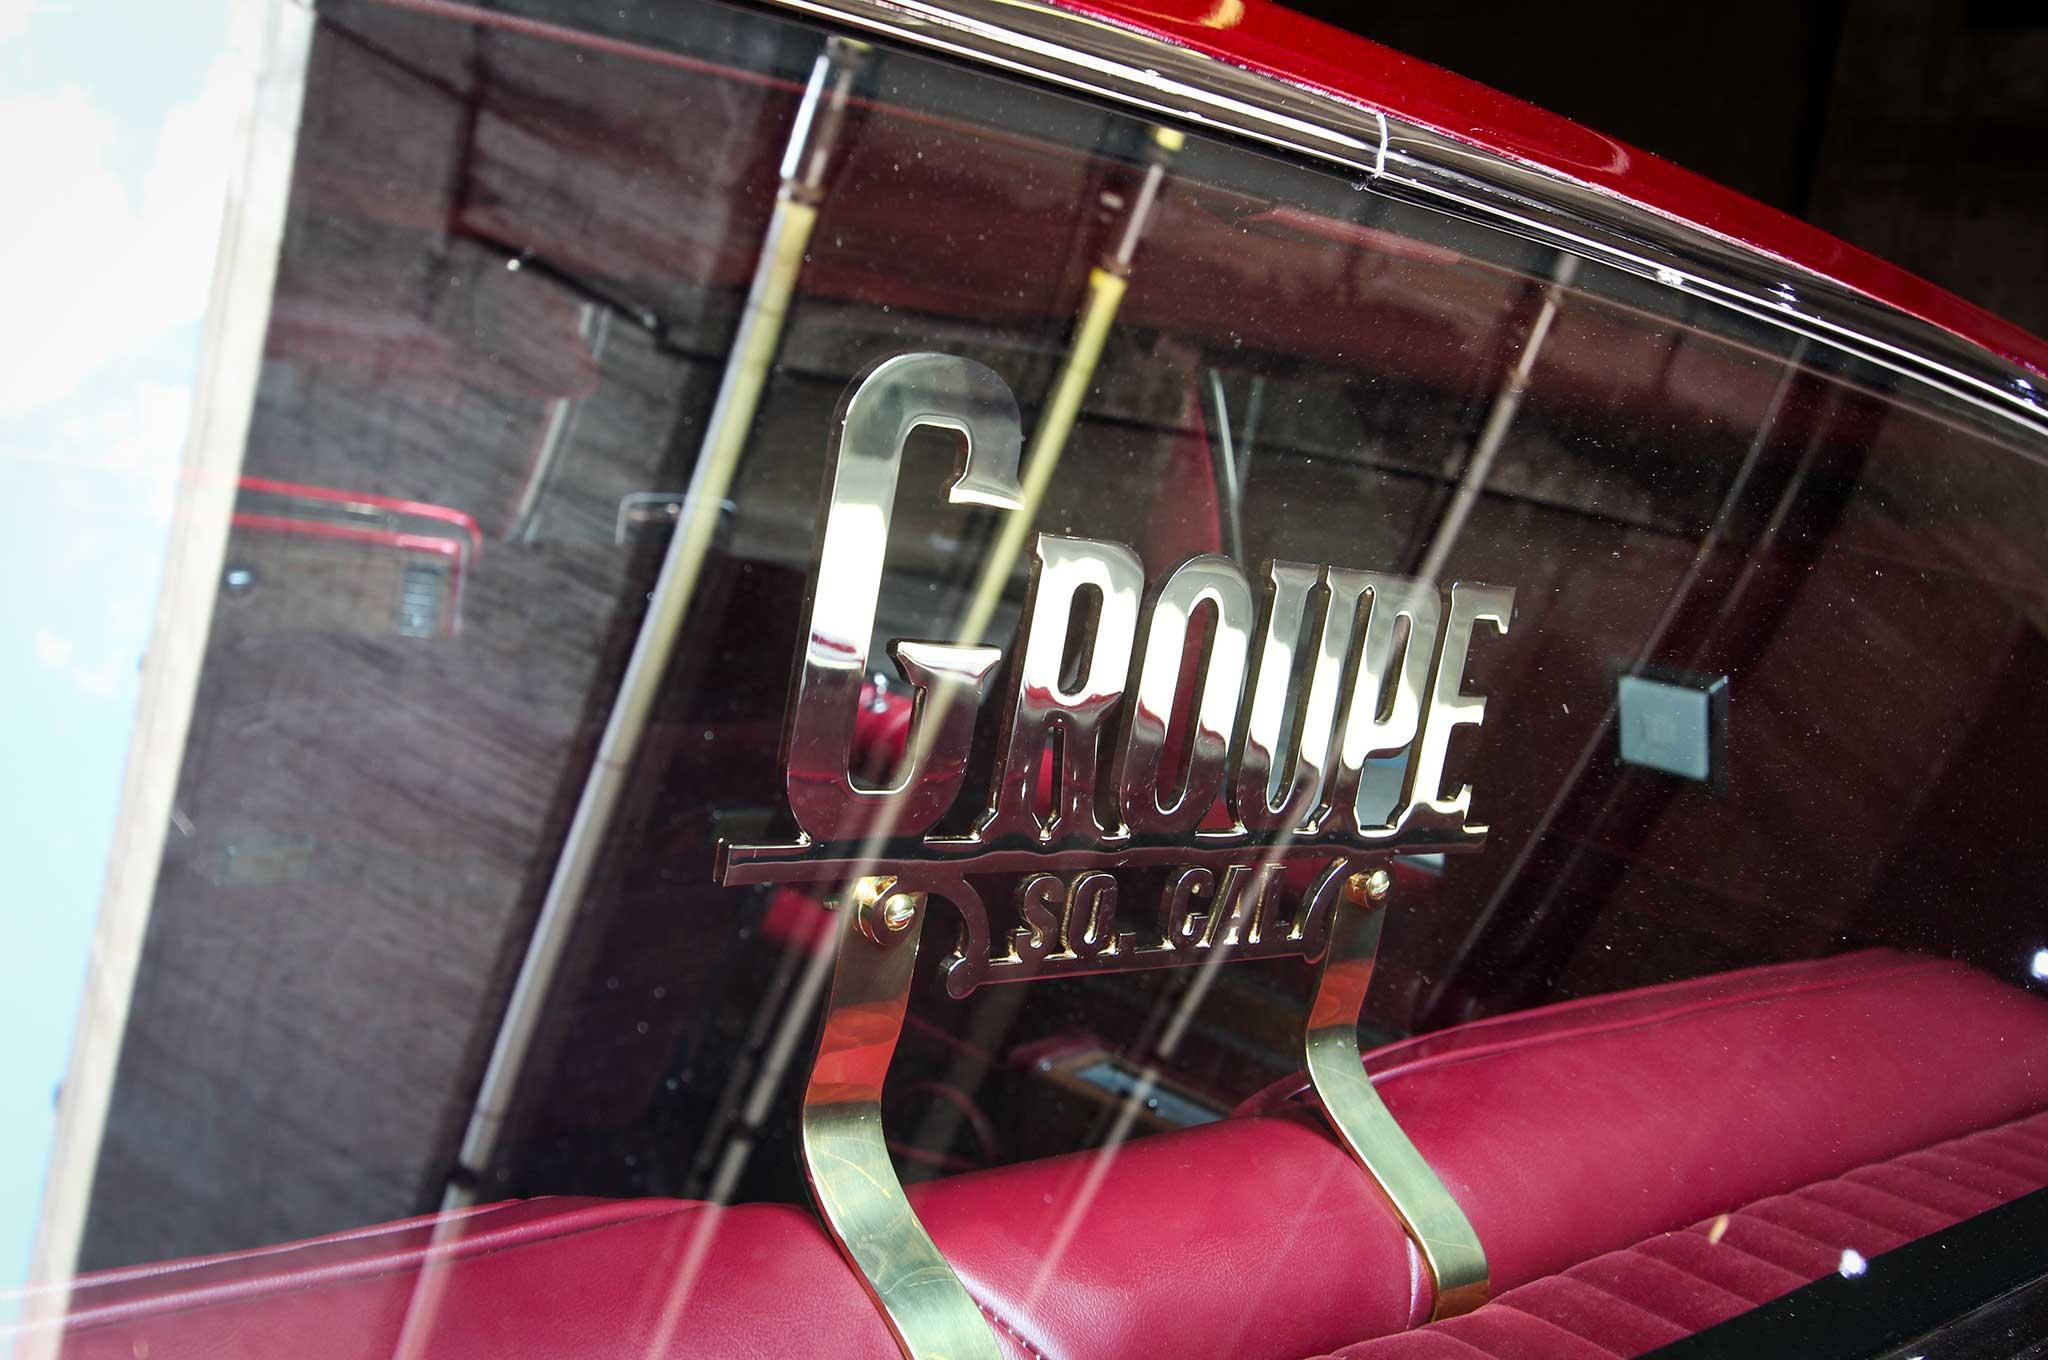 1983 cadillac coupe deville groupe club plaque 018